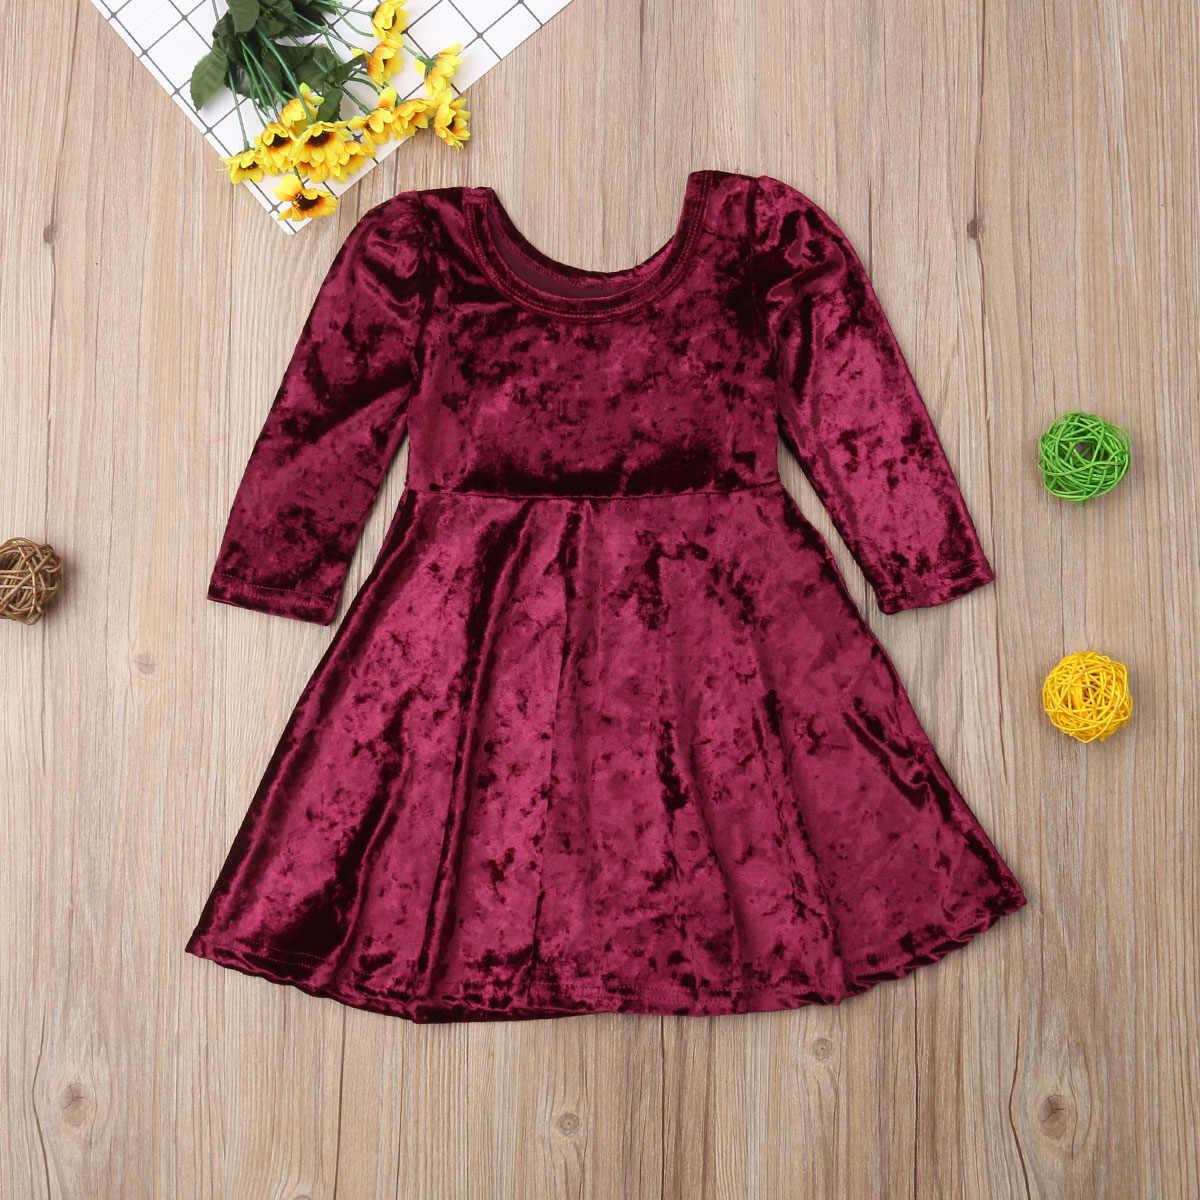 38102afc625 ... 1-6Y Toddler Kids Baby Girl Long Sleeve Wine Red Velvet Dress Princess  Girls A